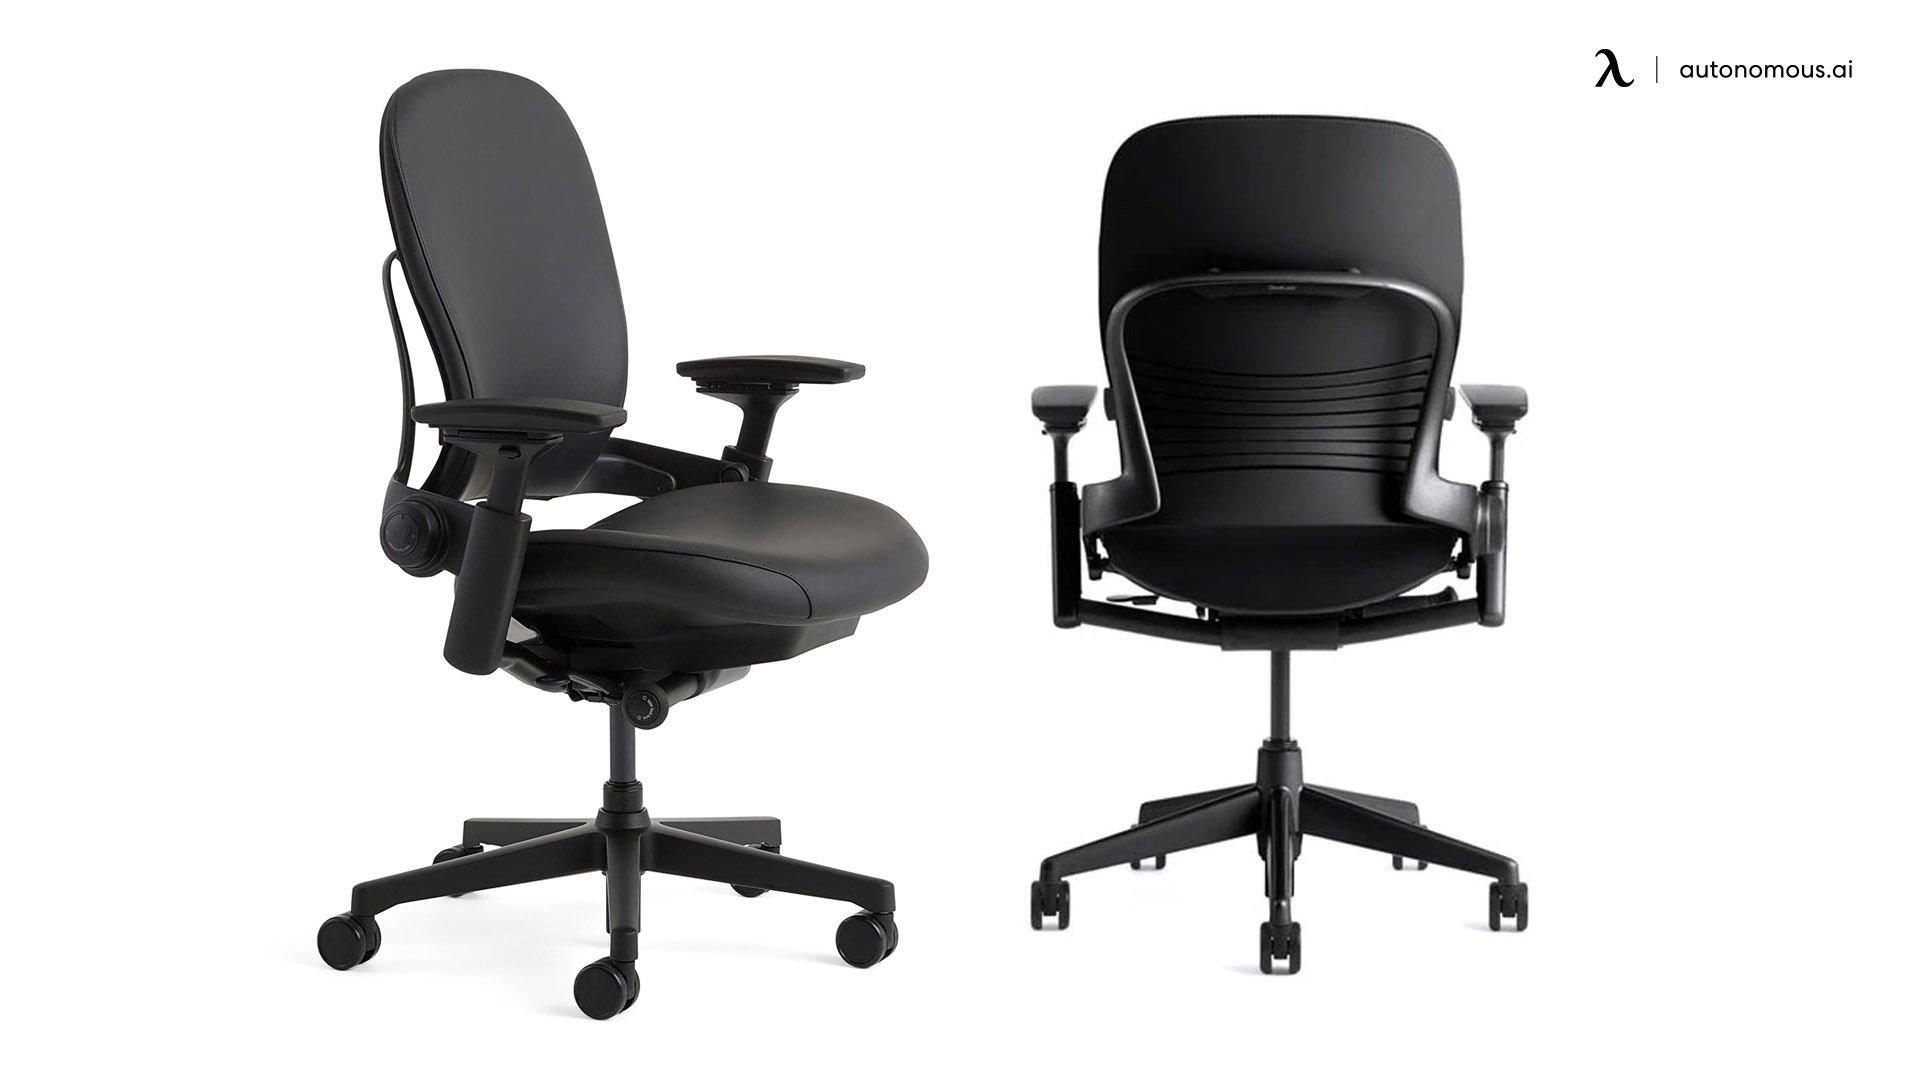 SteelCase - office chair design